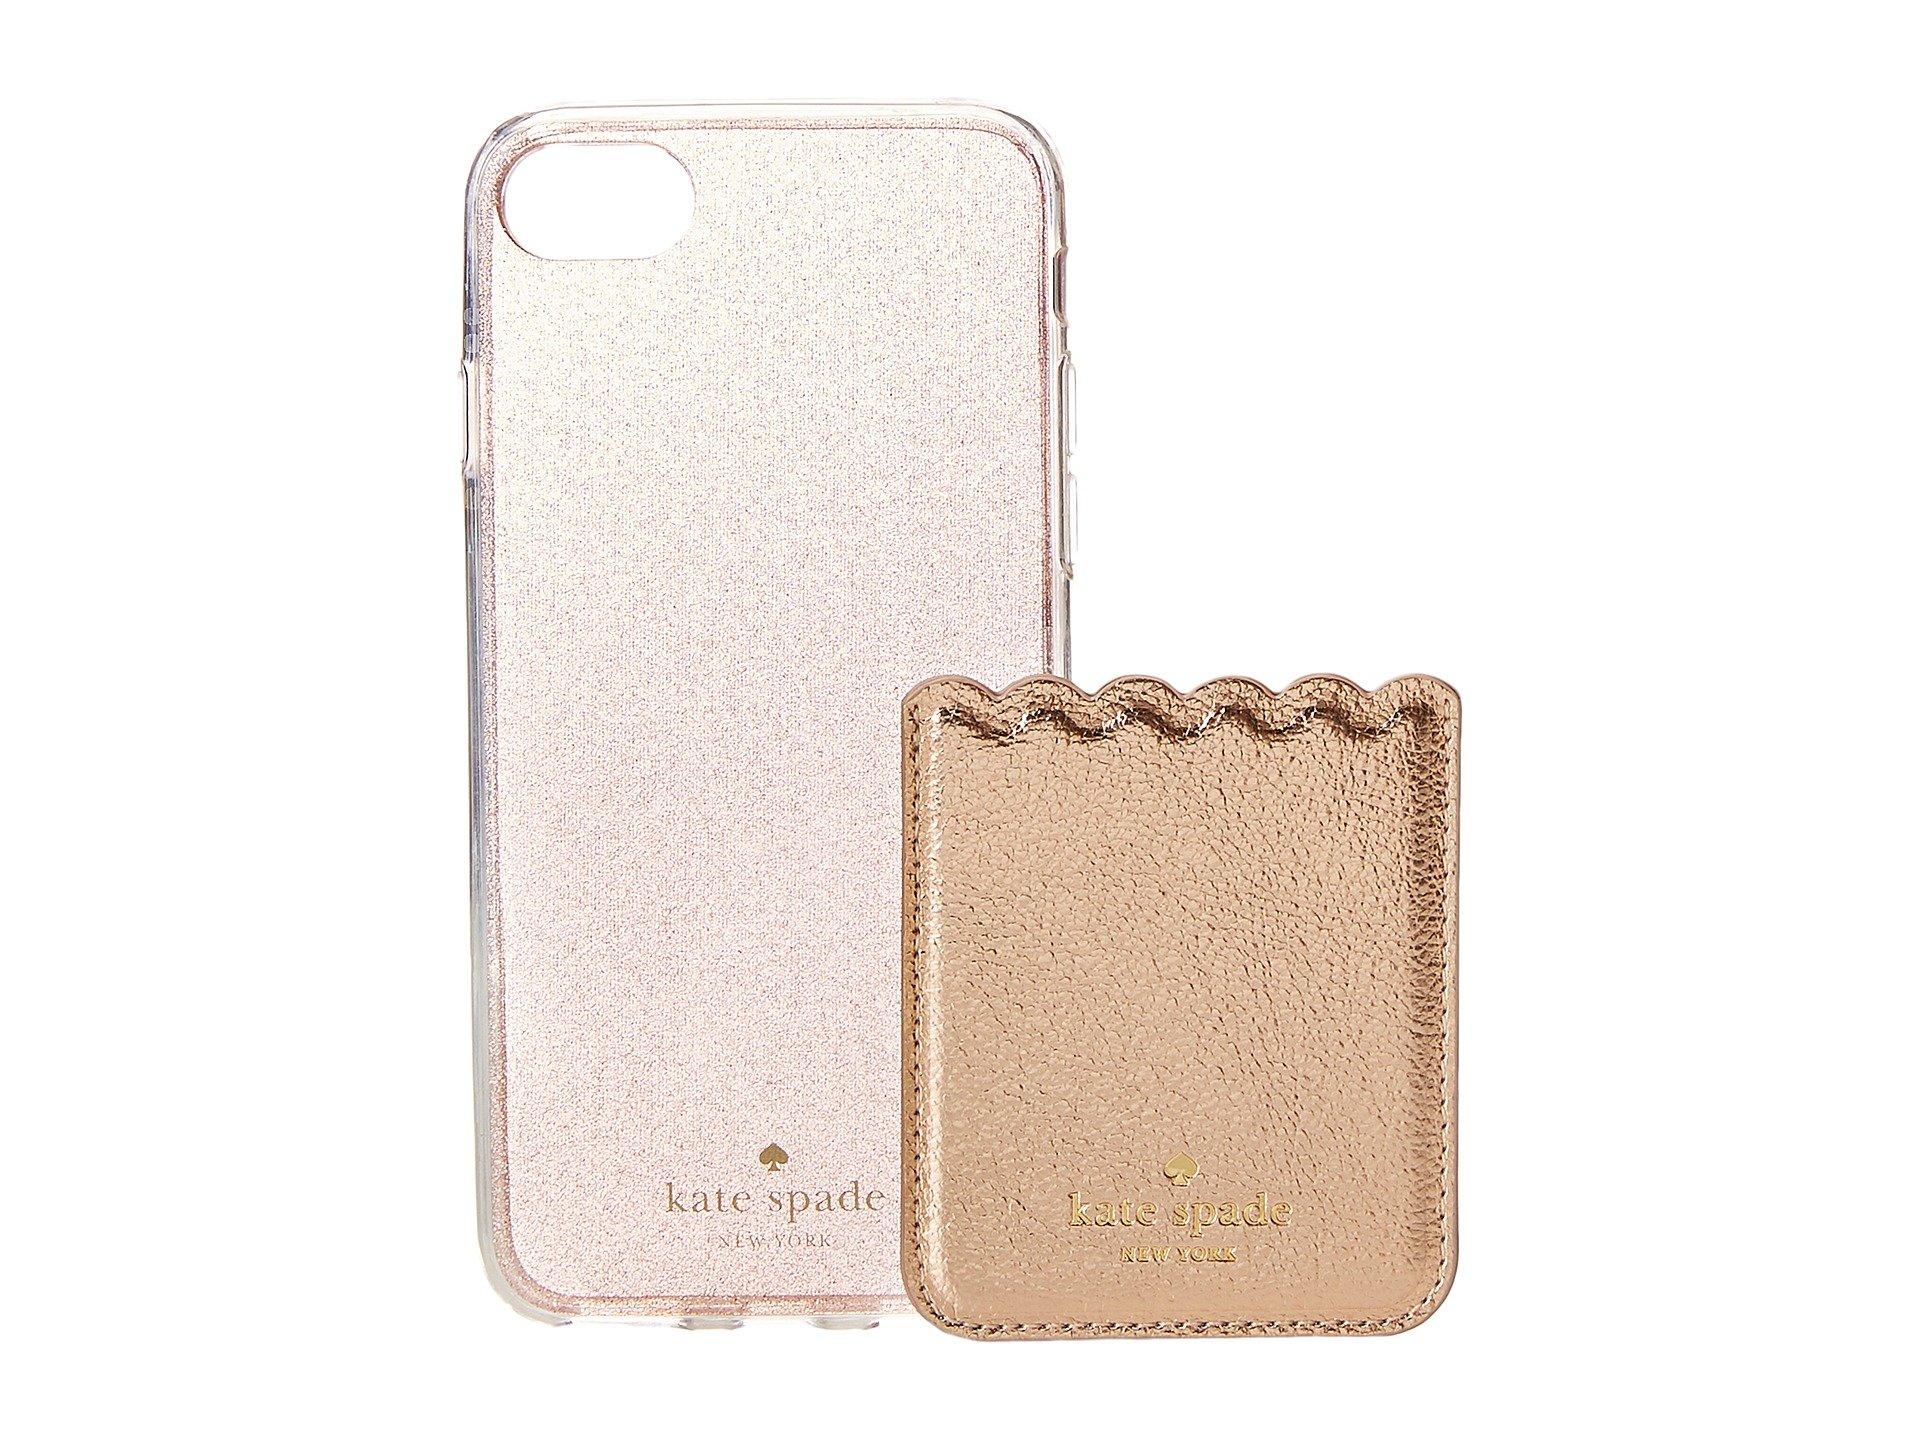 Accesorio para el Celular Kate Spade New York Stick to It Phone Case for iPhone® 7/iPhone® 8  + Kate Spade New York en VeoyCompro.net